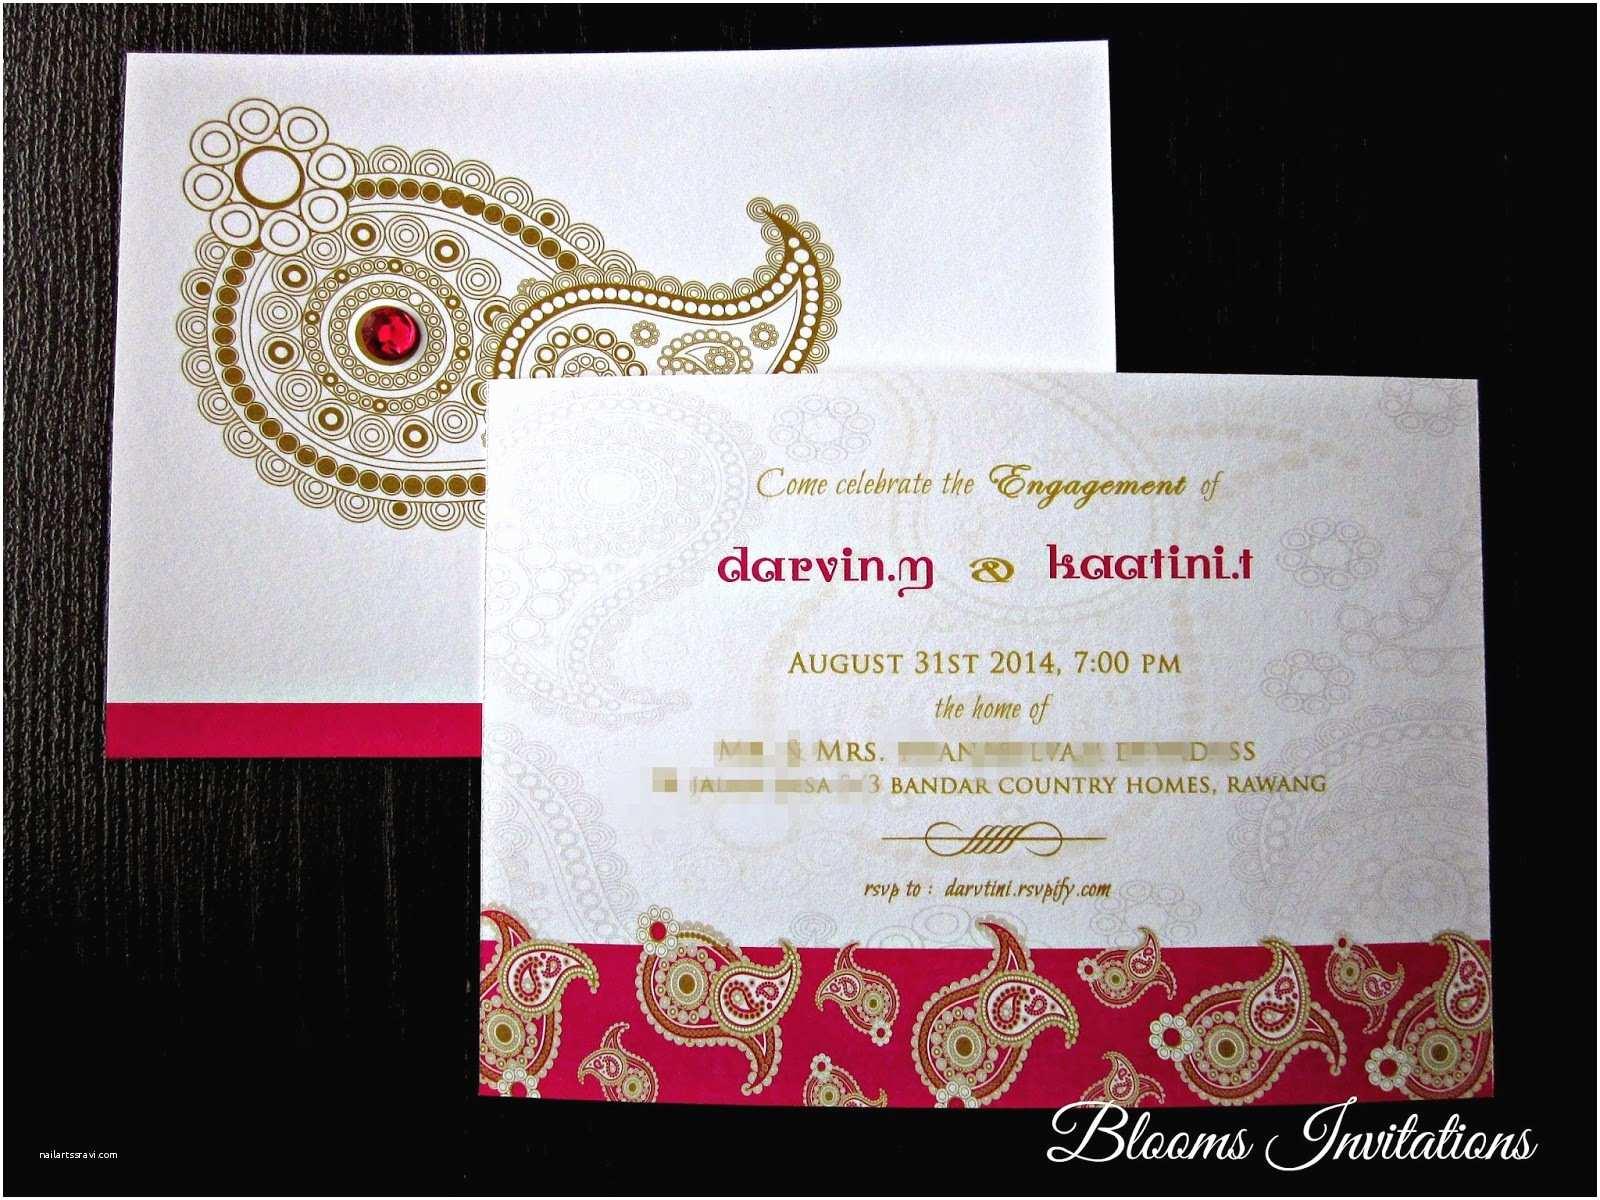 Custom Made Wedding Invitations Handmade Custom Wedding Invitation Malaysia Stationery and